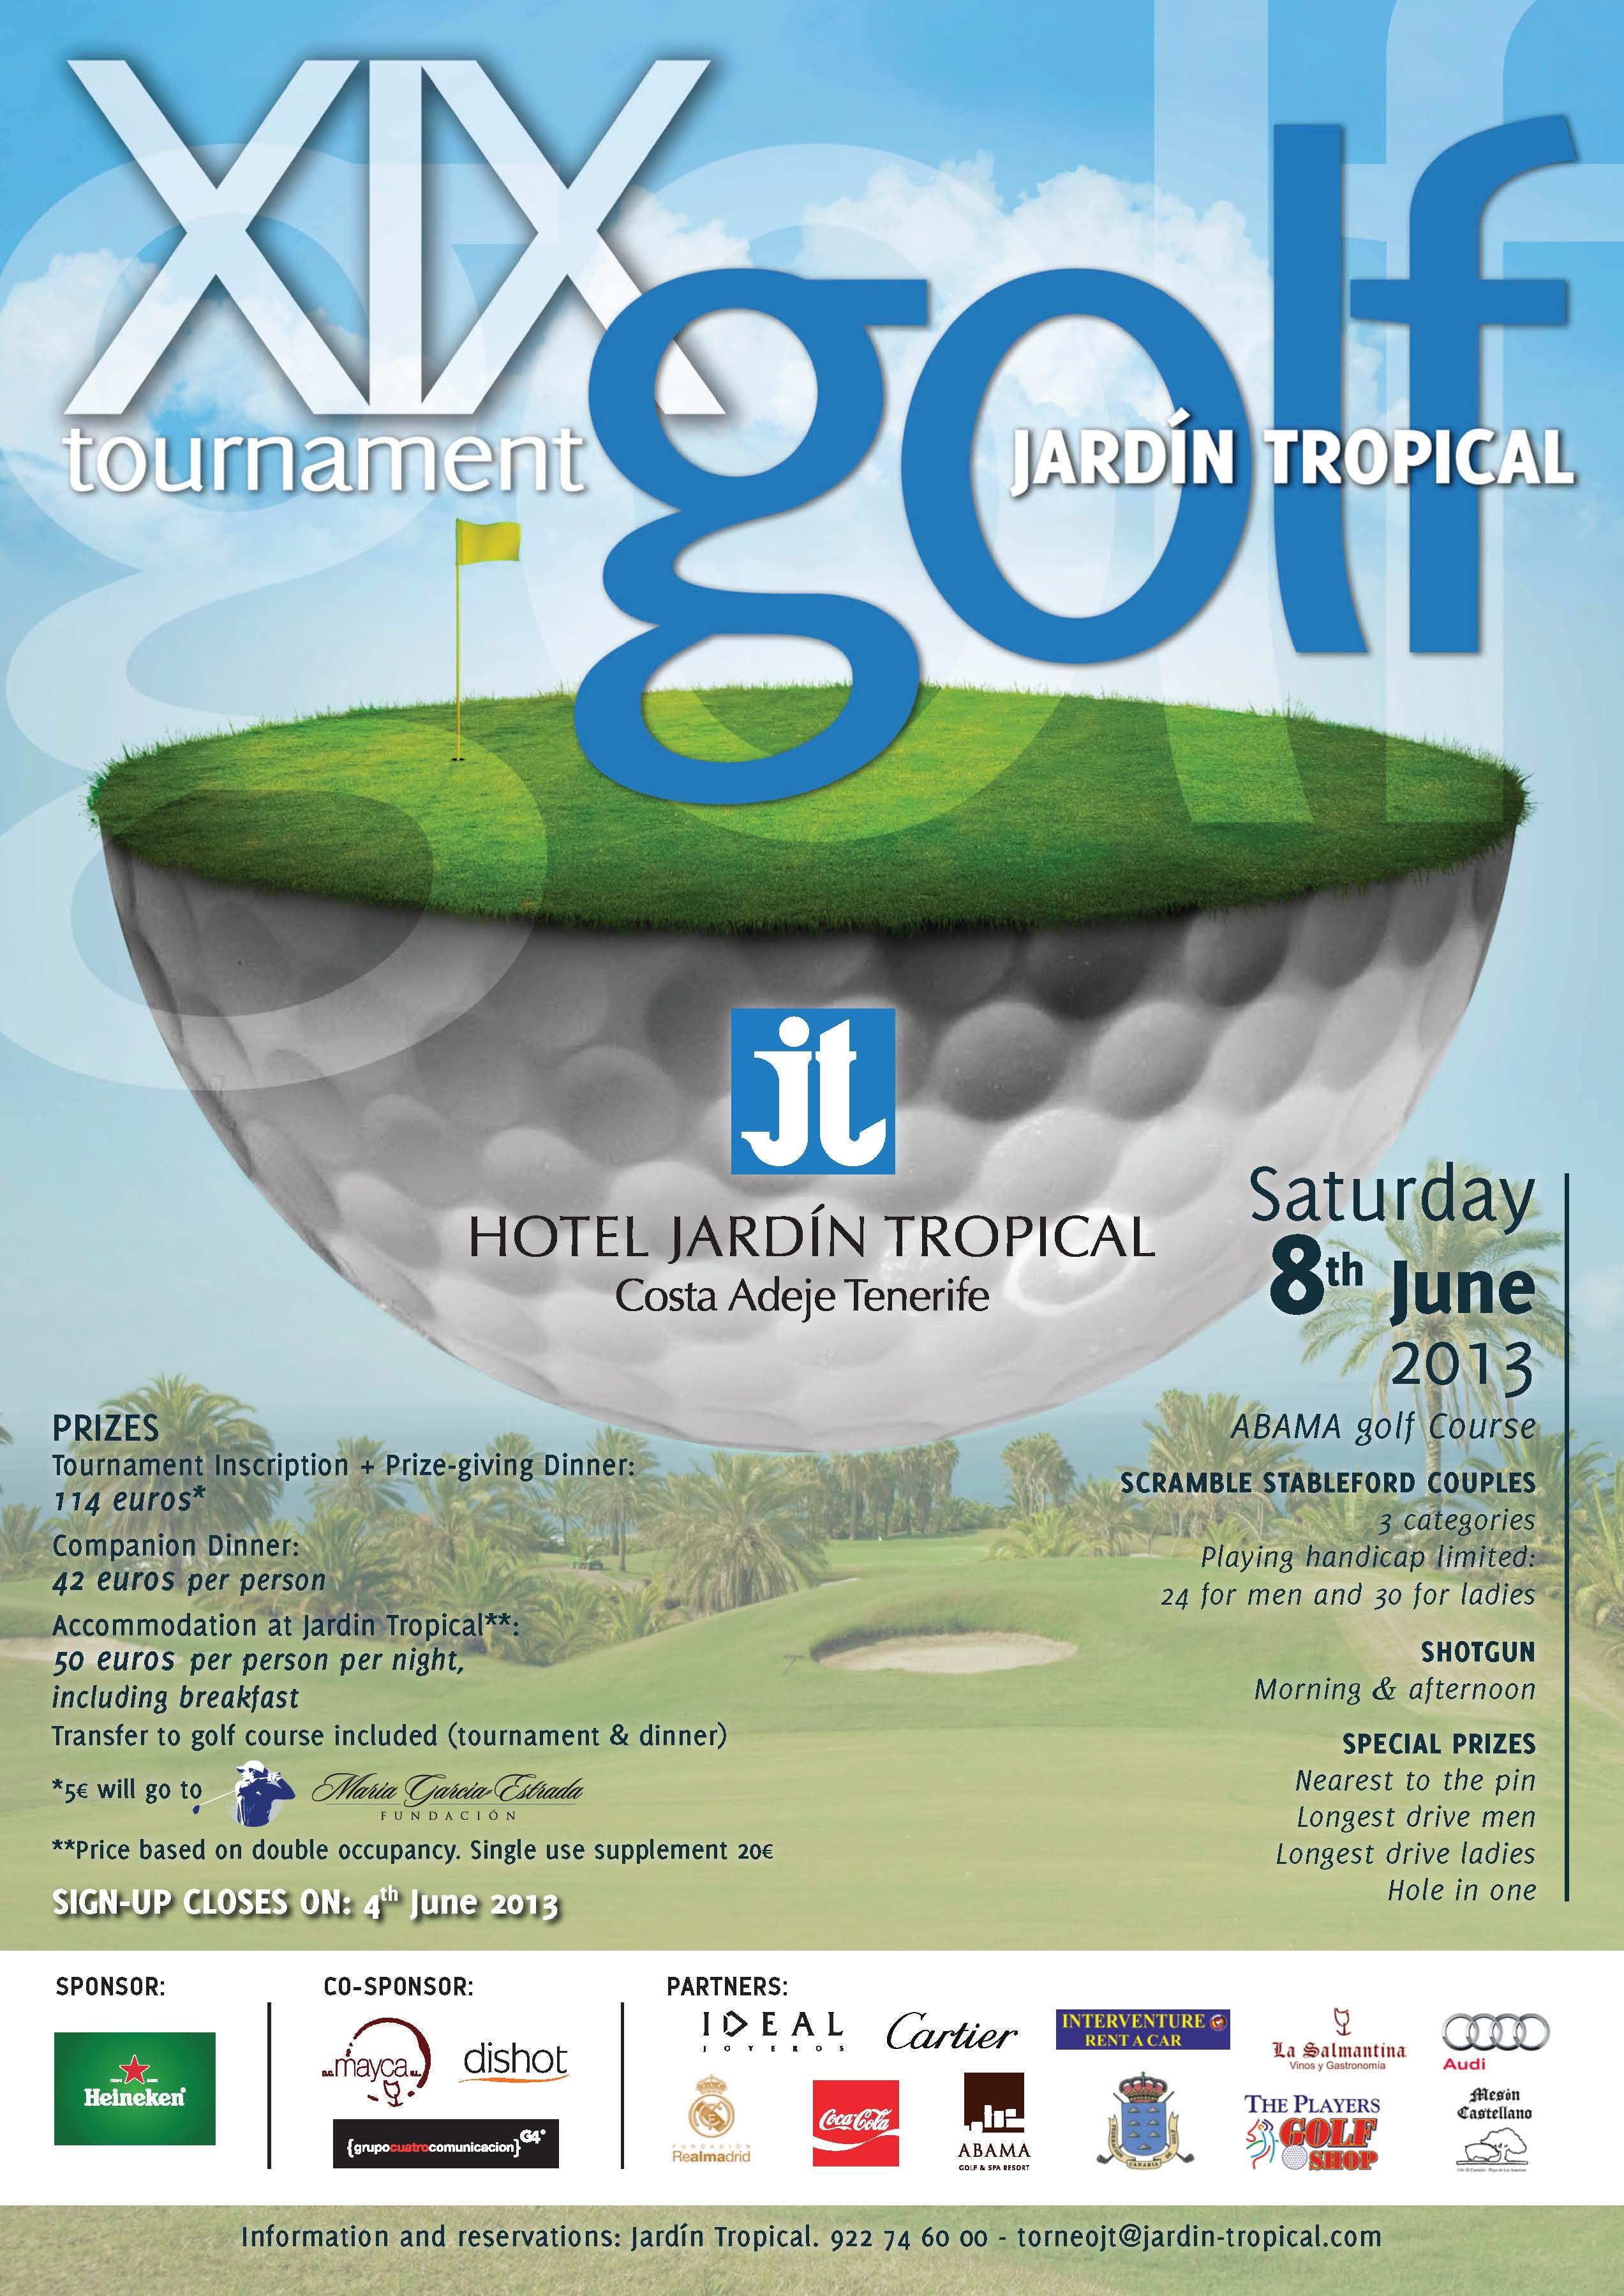 Hotel Jardin Tropical Golf Tournament 2013 365 Days To Enjoy